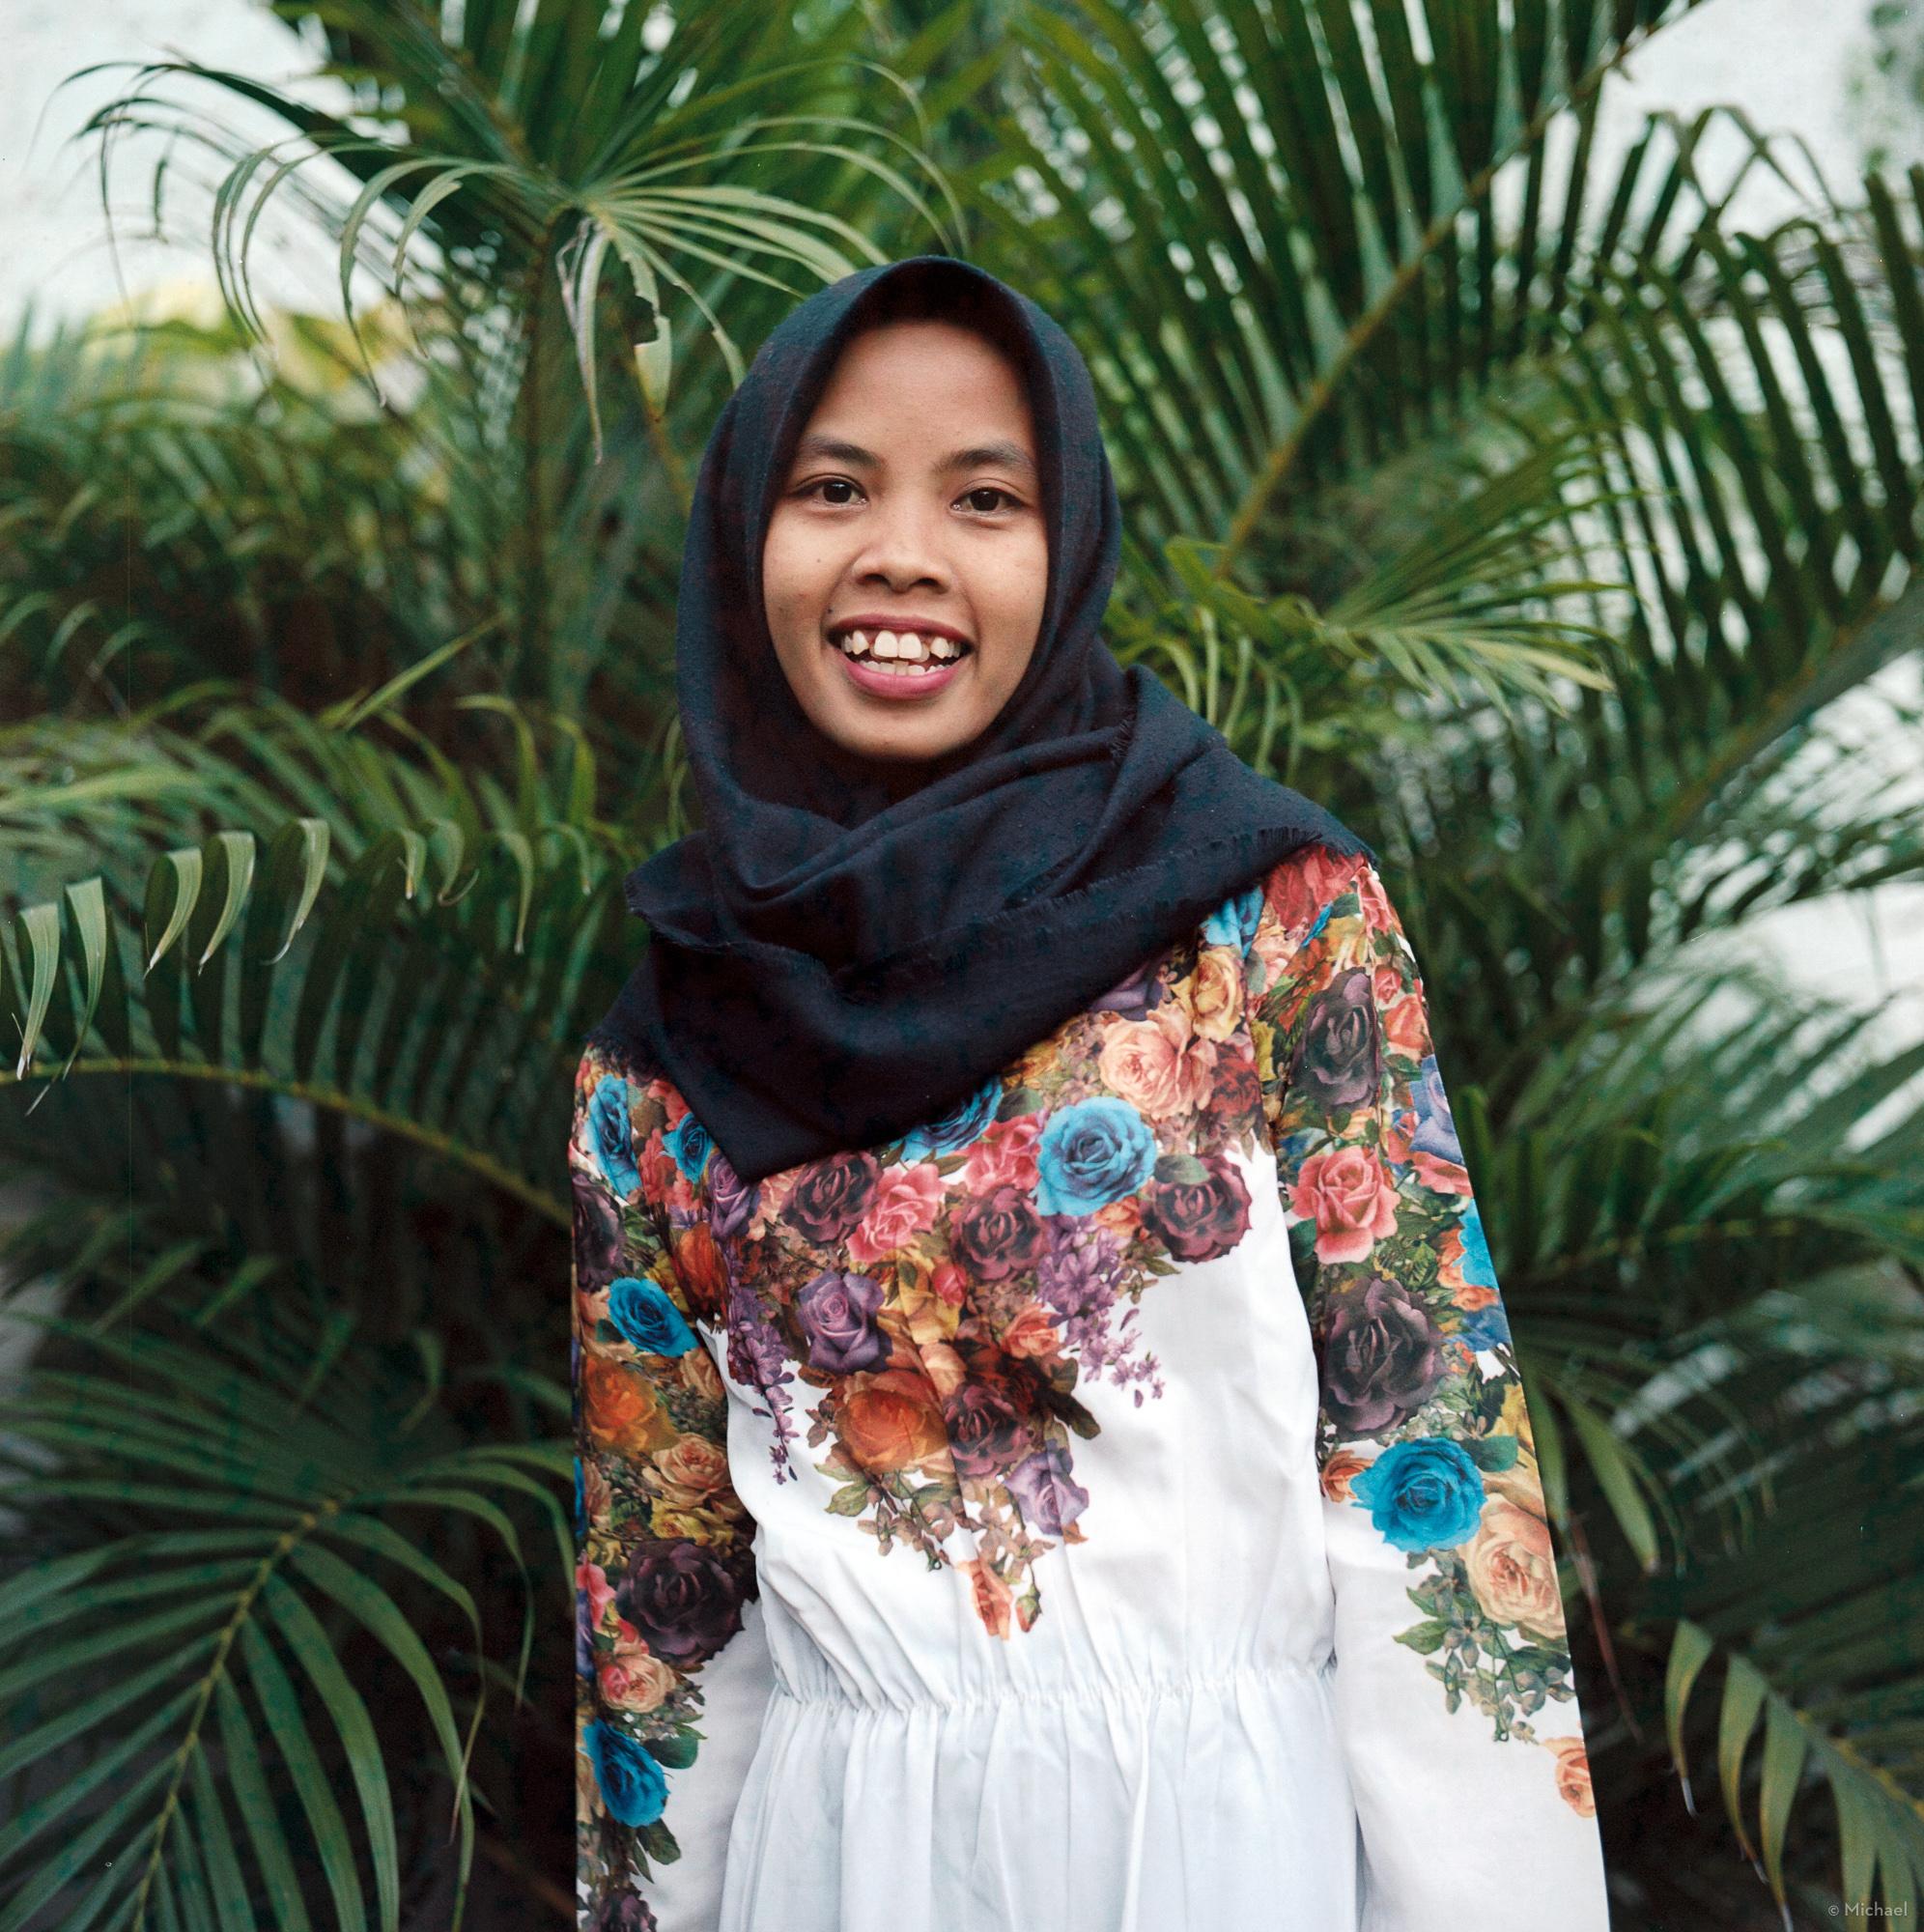 indonesie 2018-11